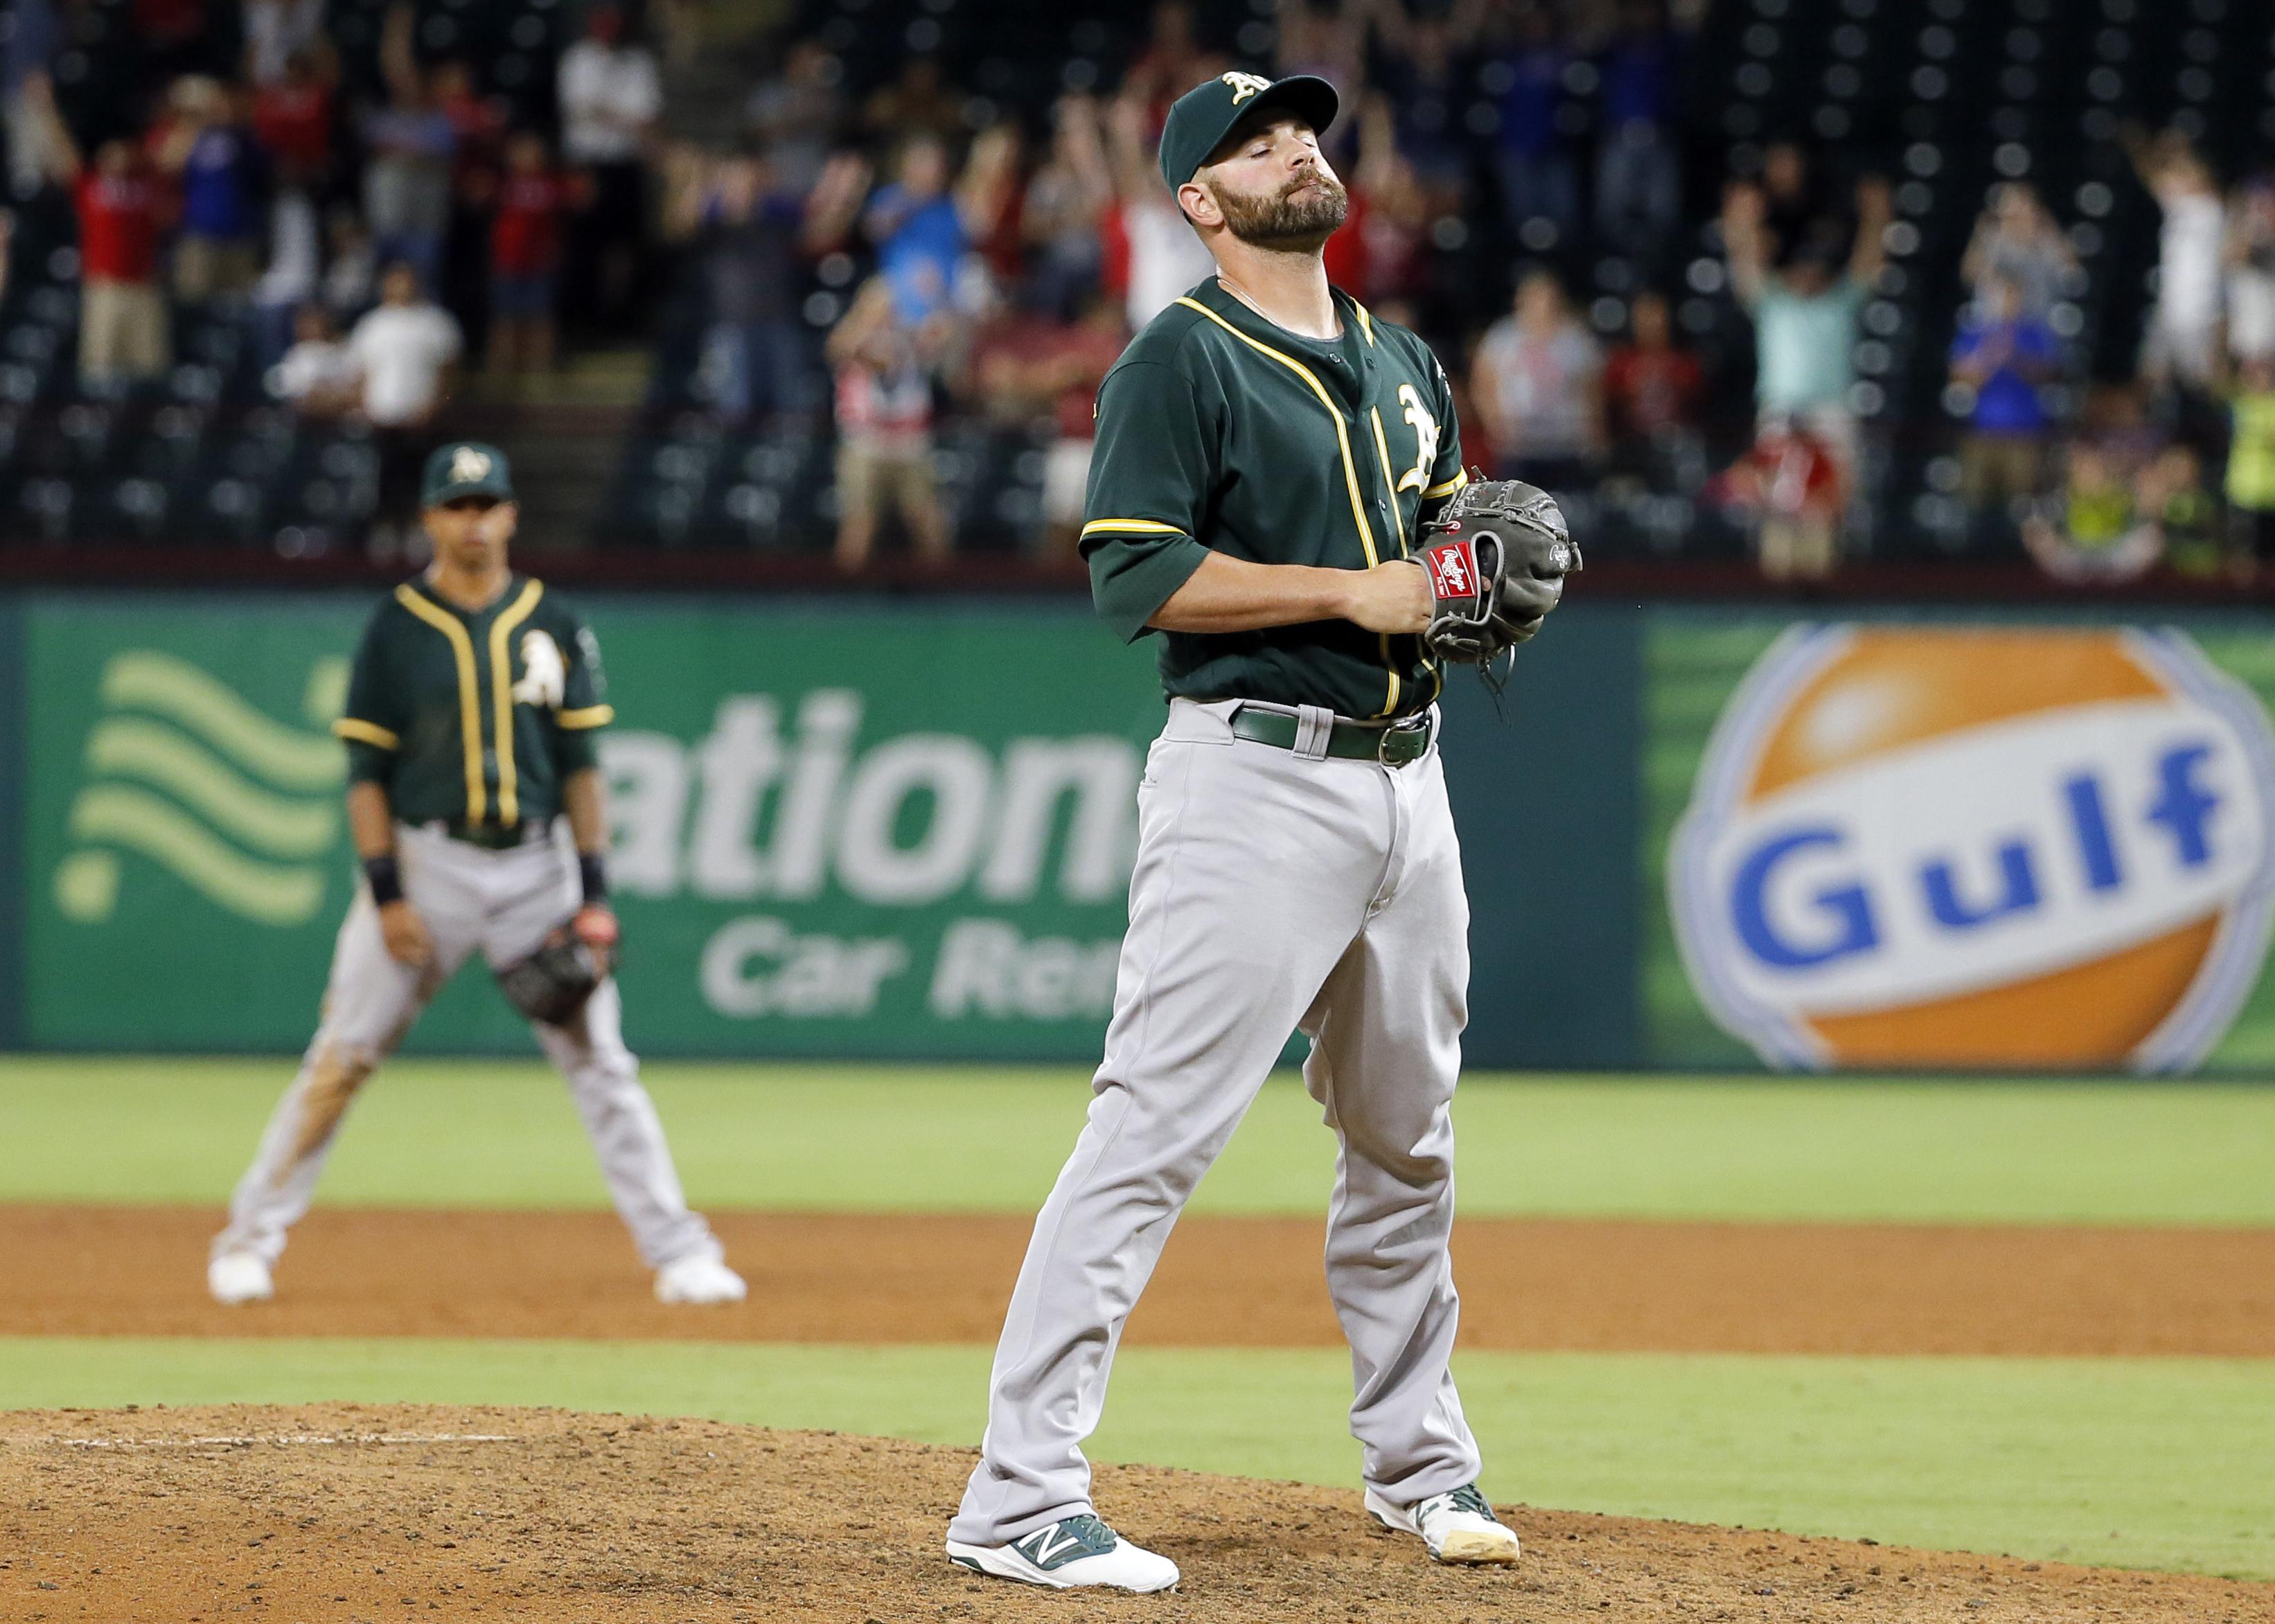 Athletics_rangers_baseball.jpeg-9eeca